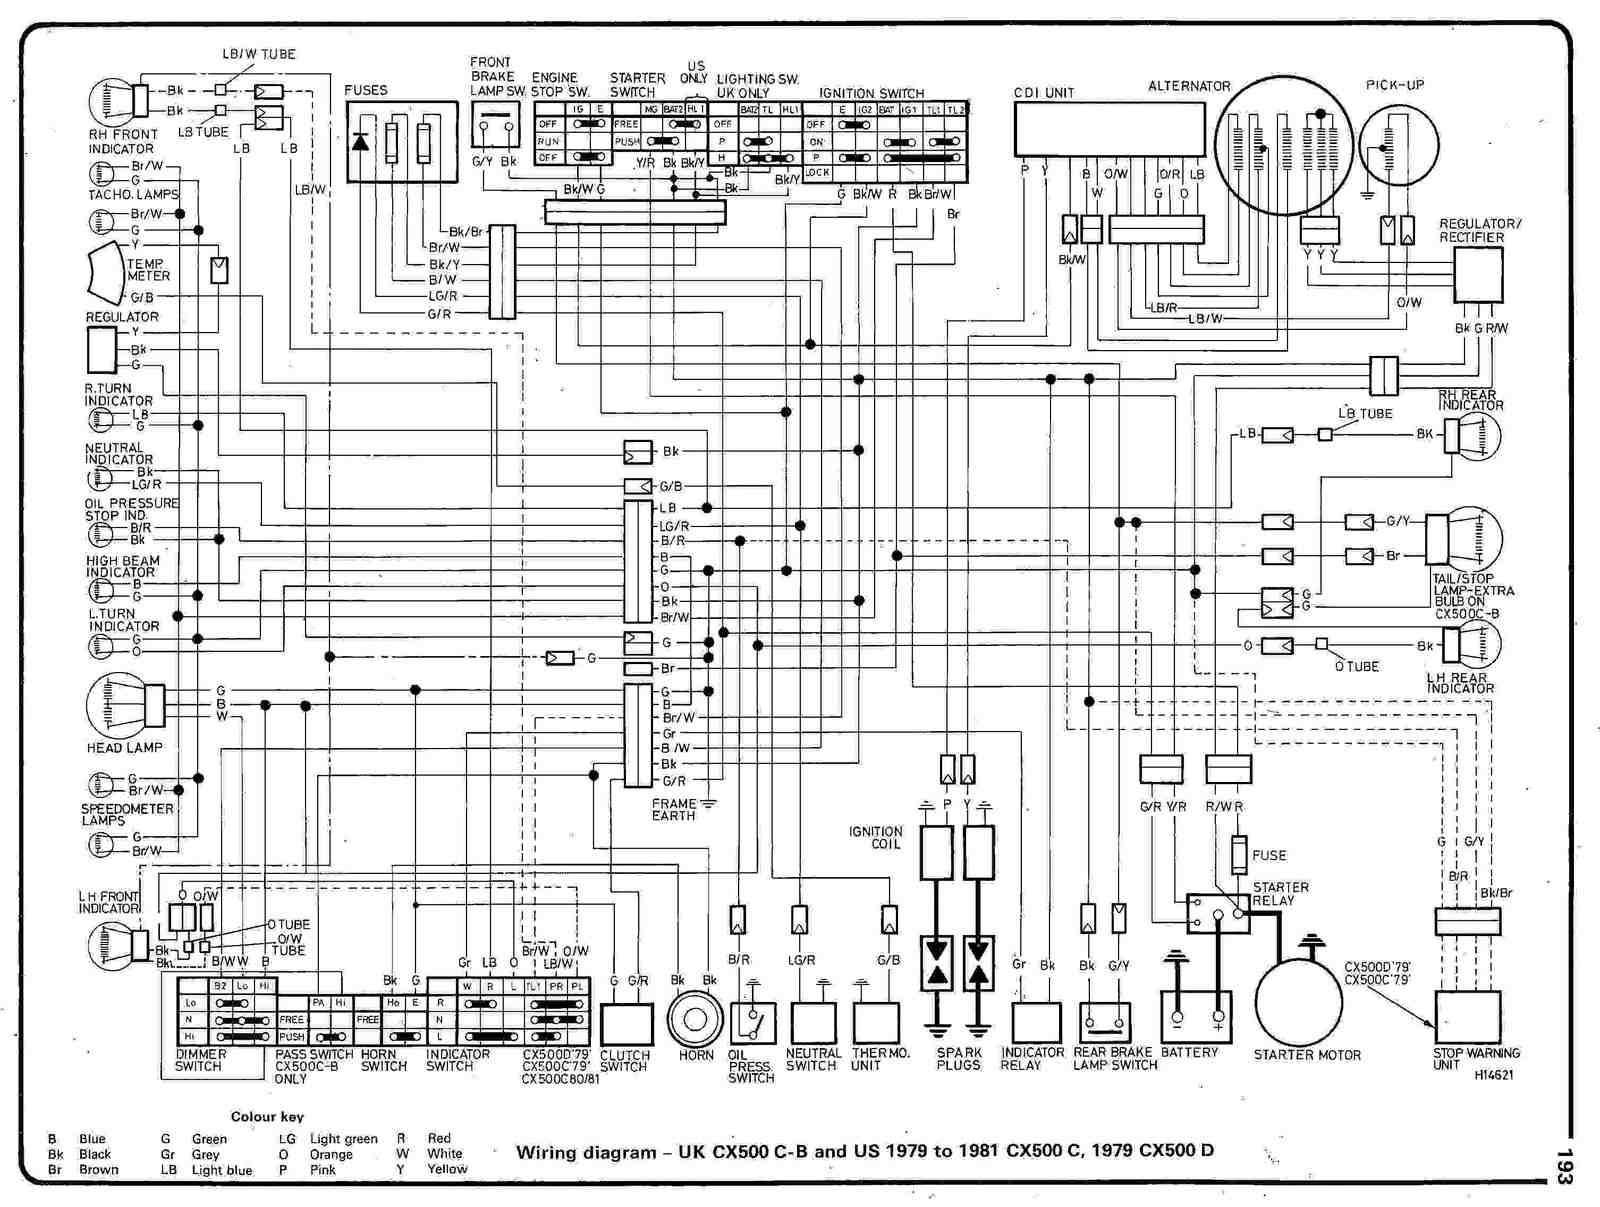 1979 honda cm400a wiring diagram wiring diagrams lol 1979 Honda Cb125s Wiring Diagram 1979 honda cm400a wiring diagram wiring diagram update 1979 honda xr80 1979 honda cm400a wiring diagram